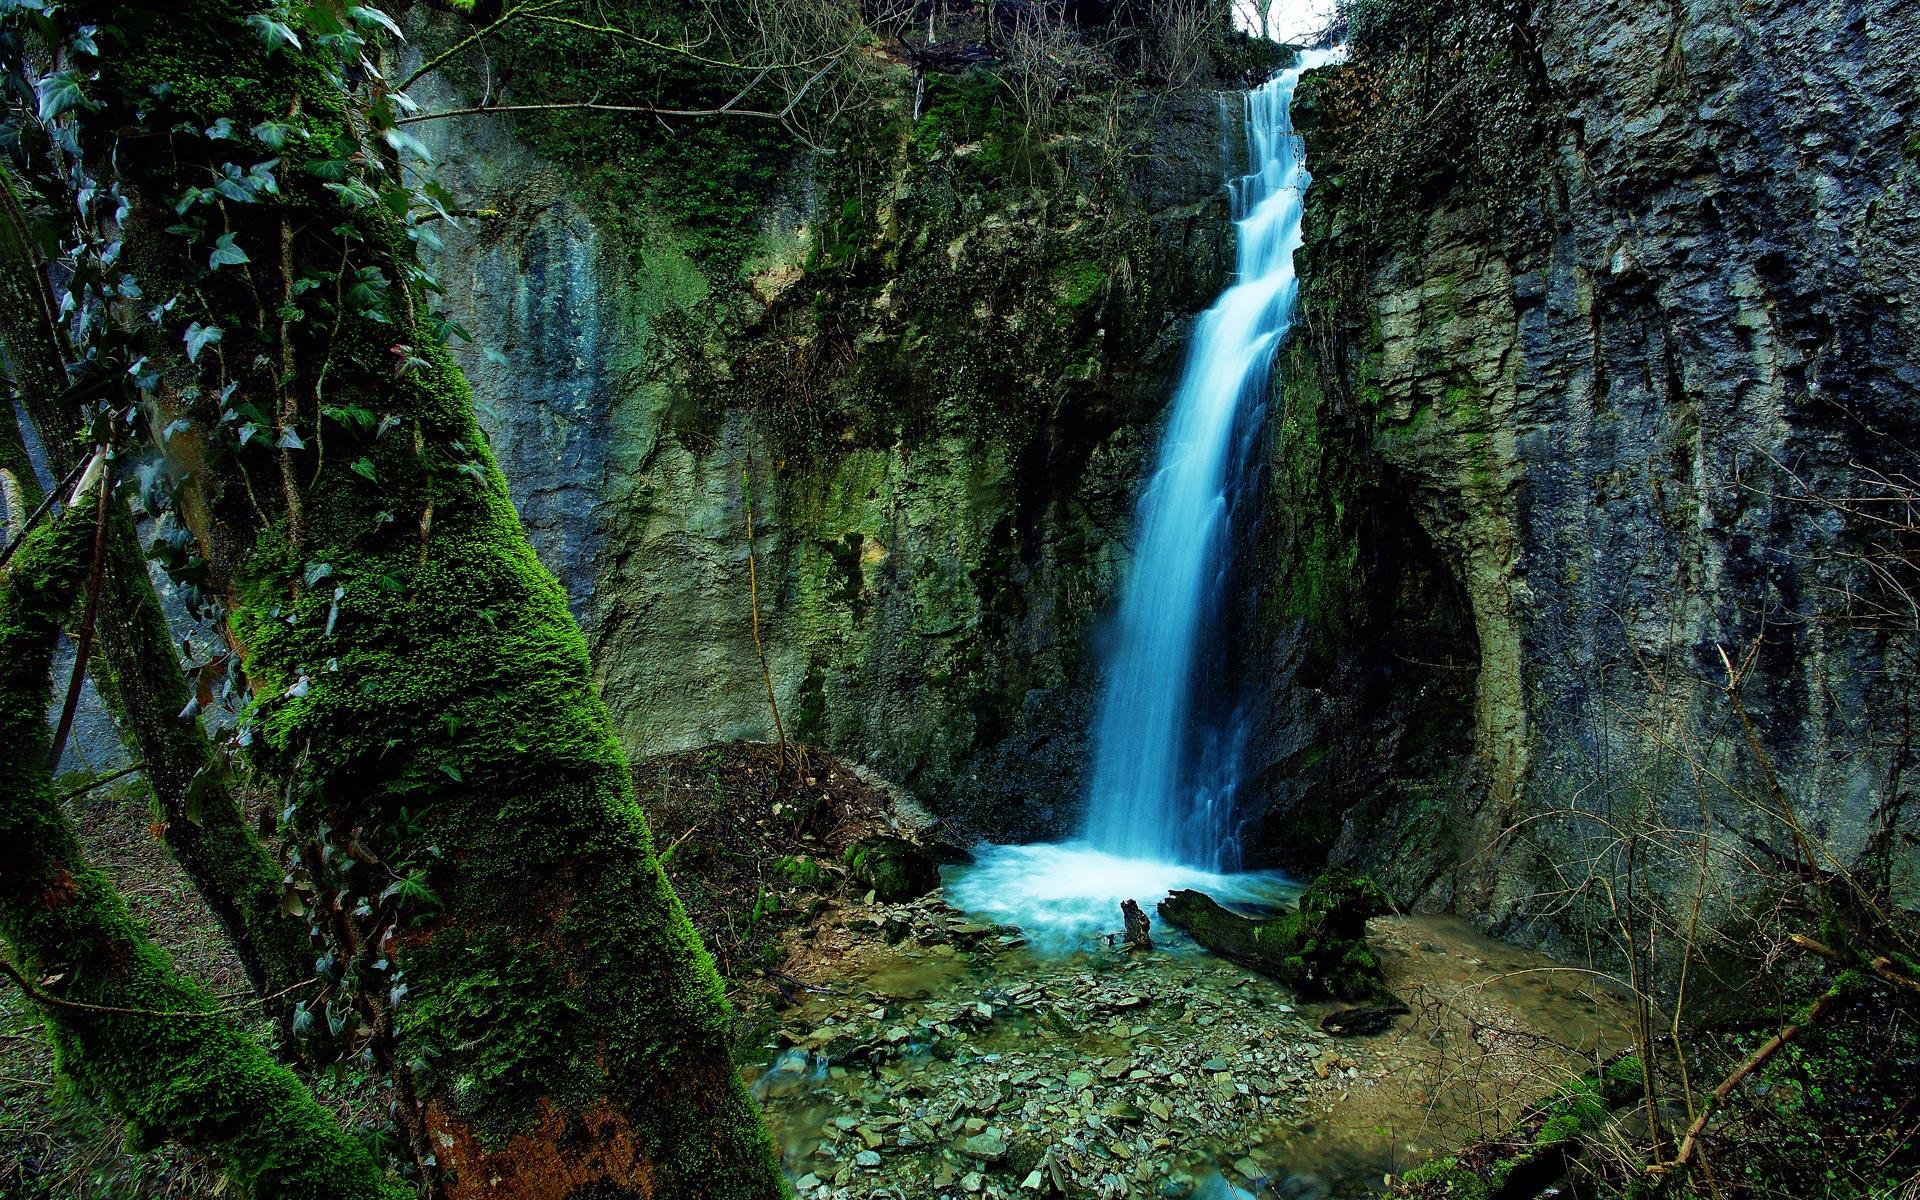 Waterfall Hd Wallpaper on WallpaperSafari